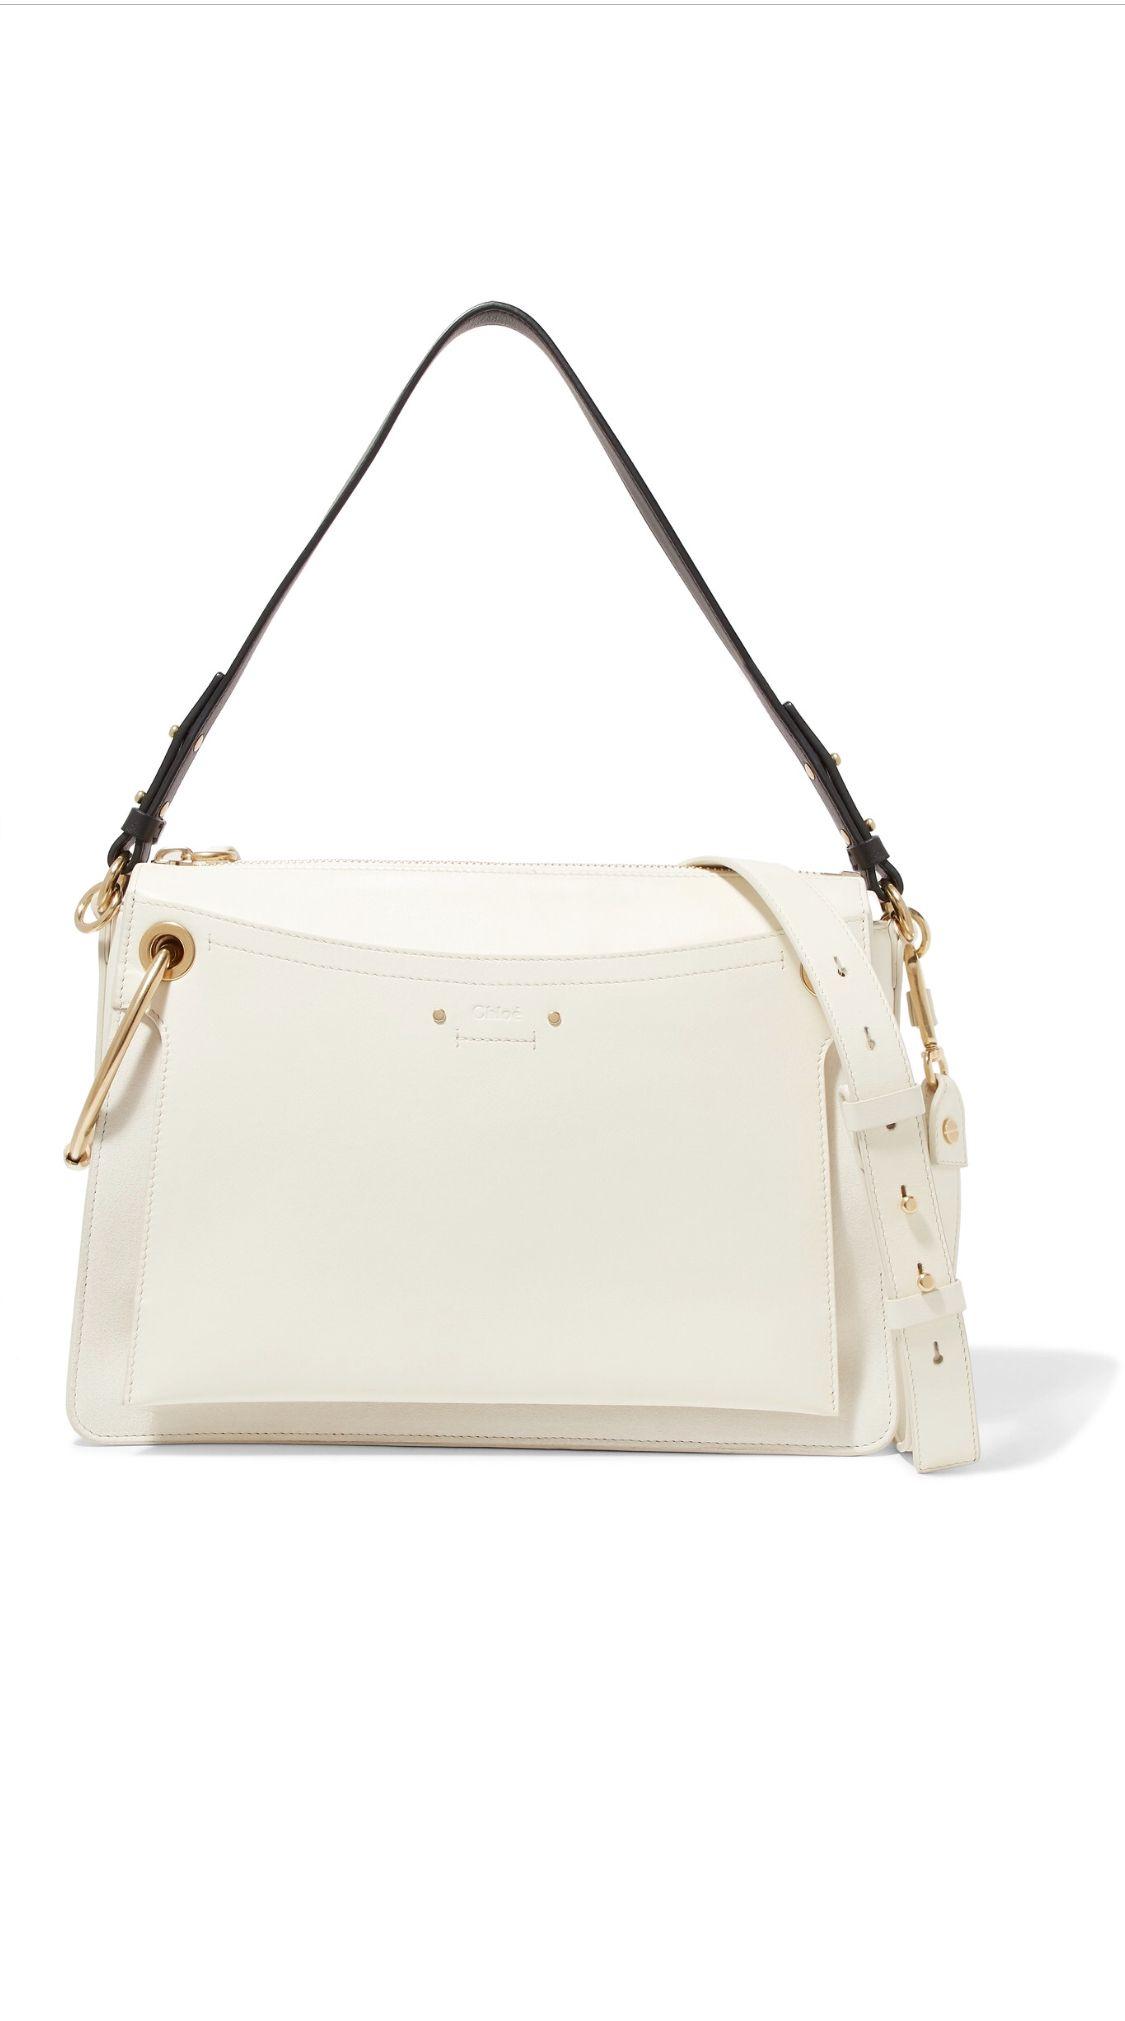 1b970fbce05 Pin by Alz Marroquin on Bag//Clutch | Chloe bag, Fashion, Designer shoes